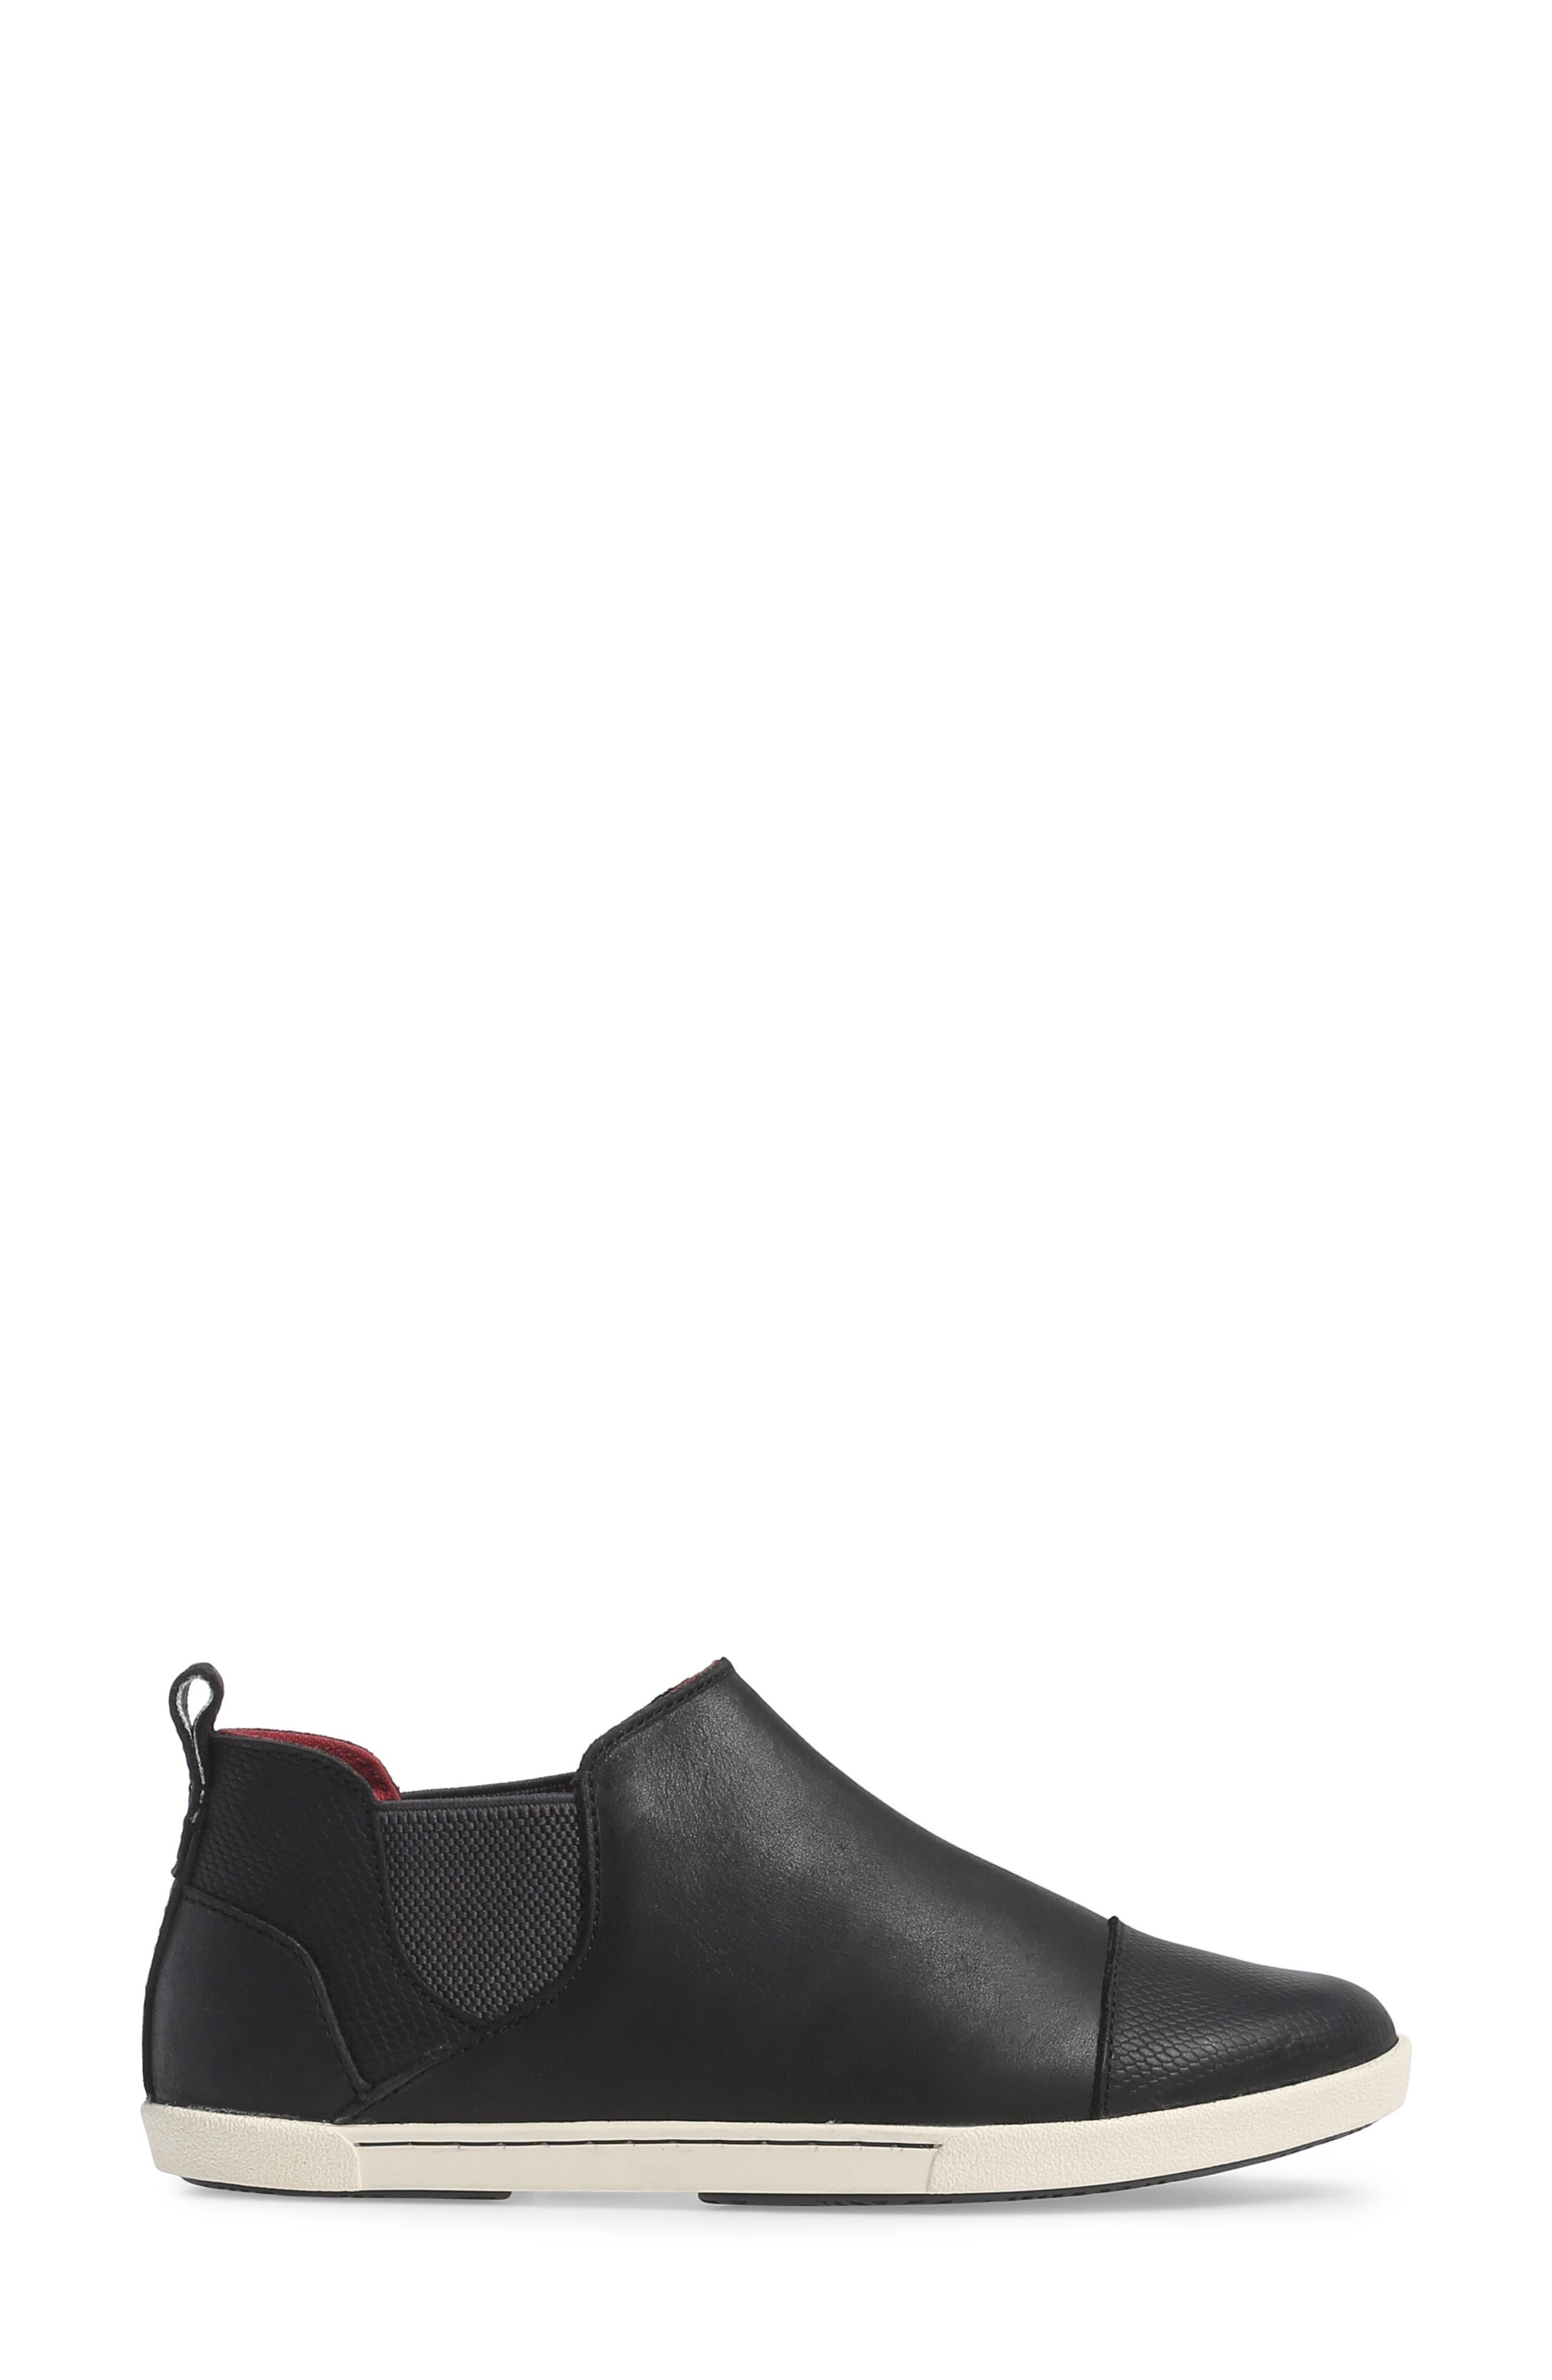 OLUKAI,                             Waipahe Chelsea Sneaker,                             Alternate thumbnail 3, color,                             001